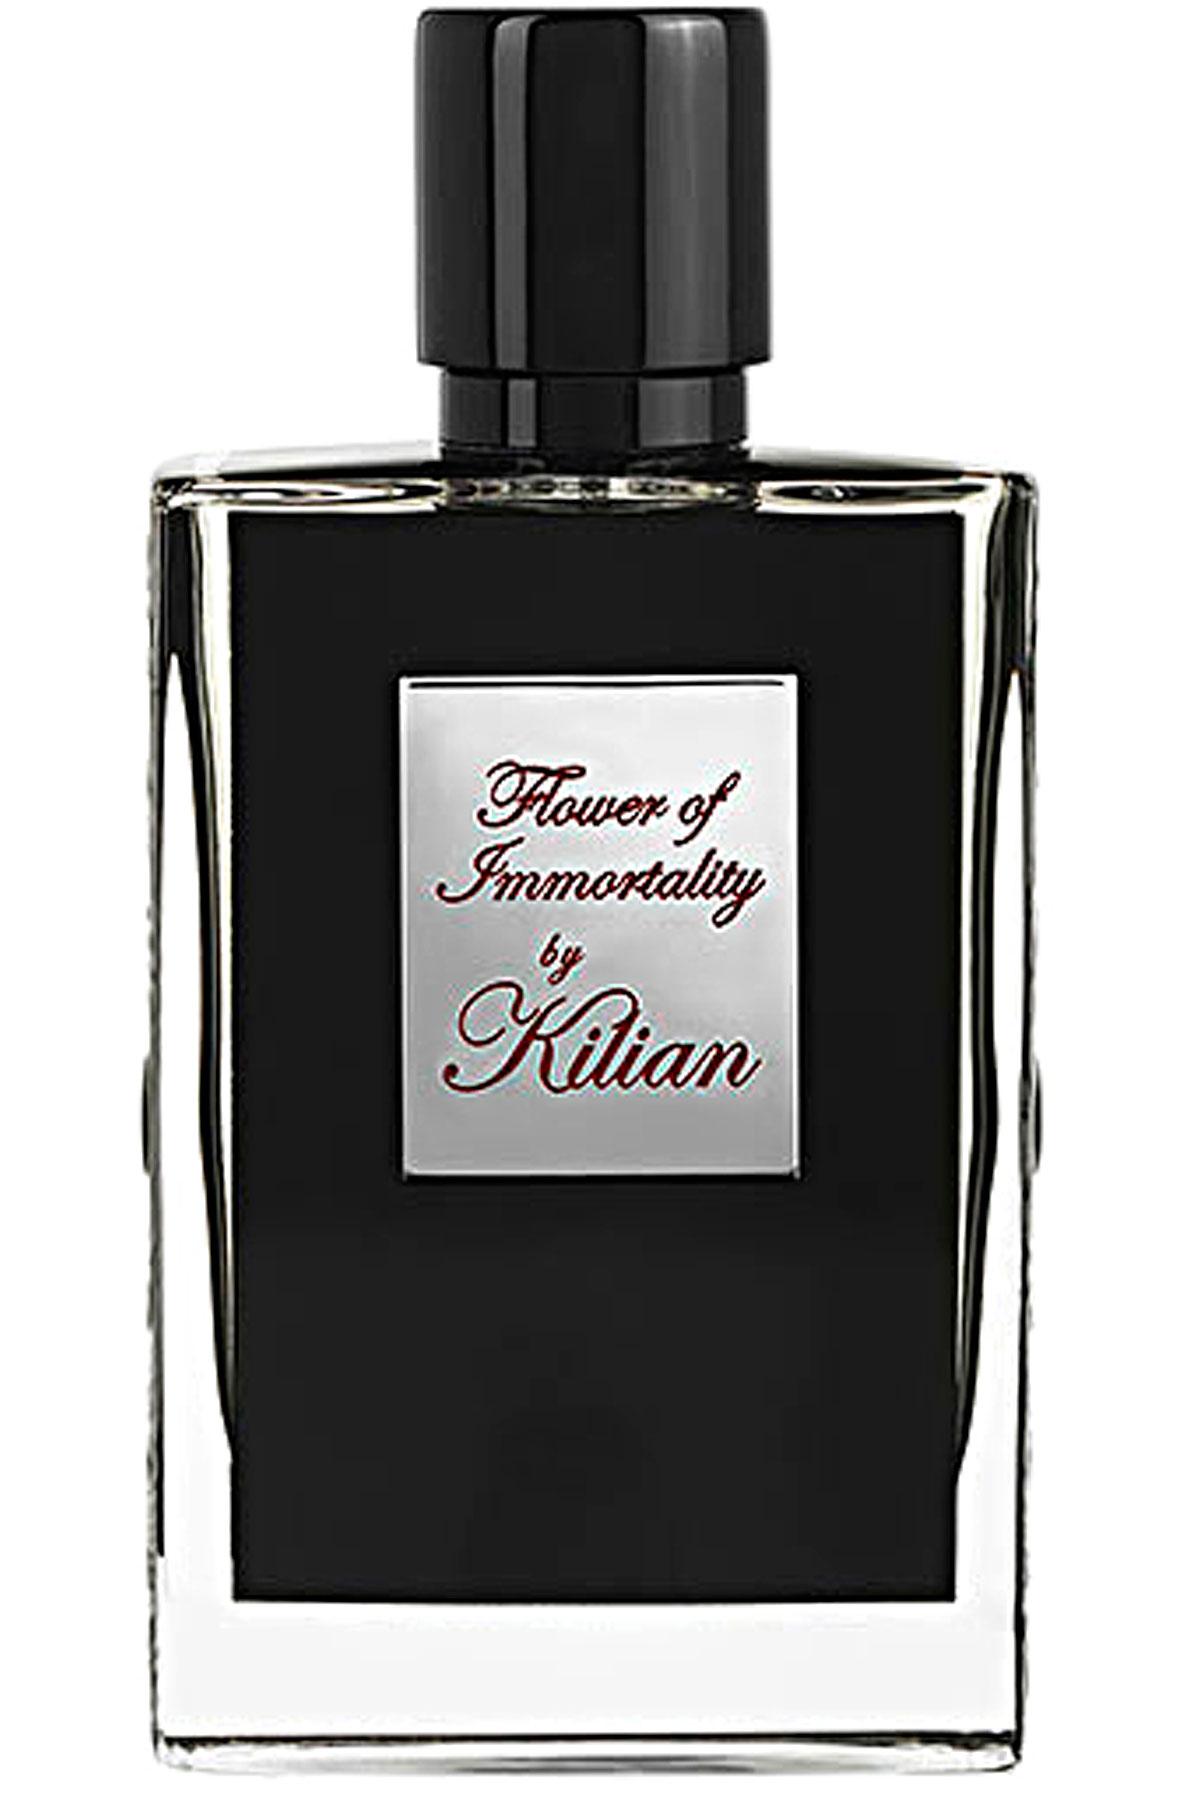 Kilian Fragrances for Women, Flower Of Immortality - Eau De Parfum - 50 Ml, 2019, 50 ml